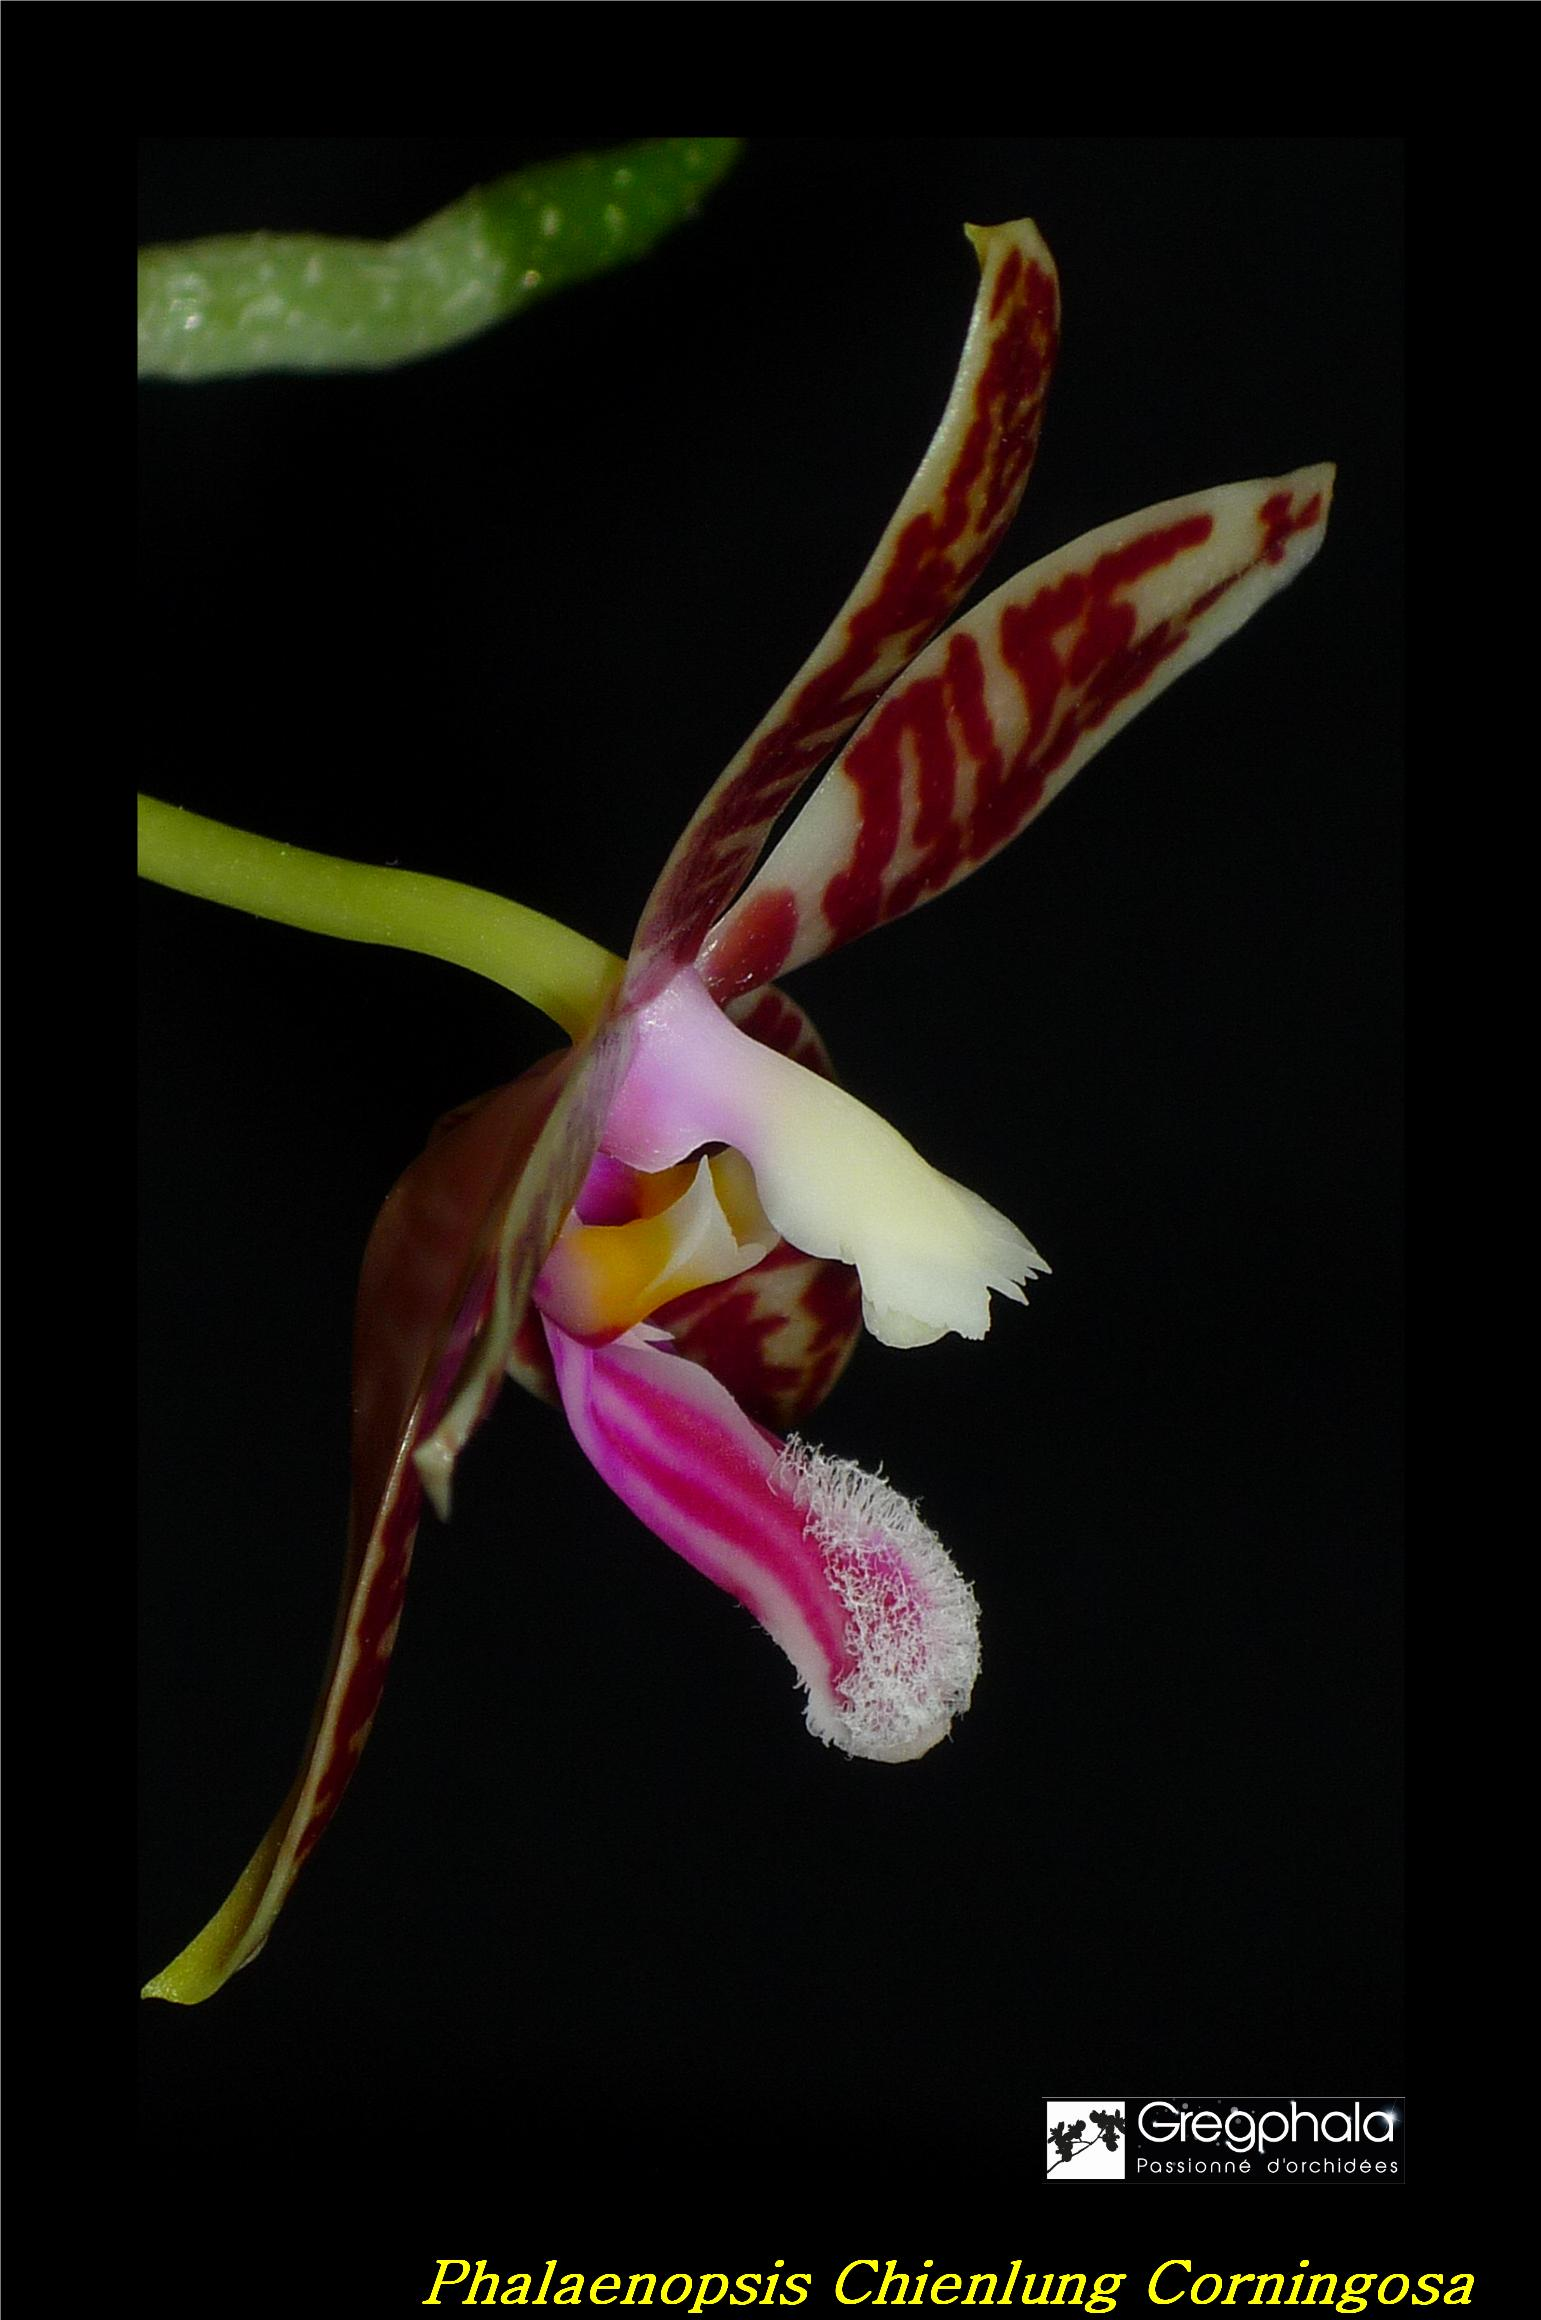 Phalaenopsis Chienlung Corningosa 17032301054017991314940076